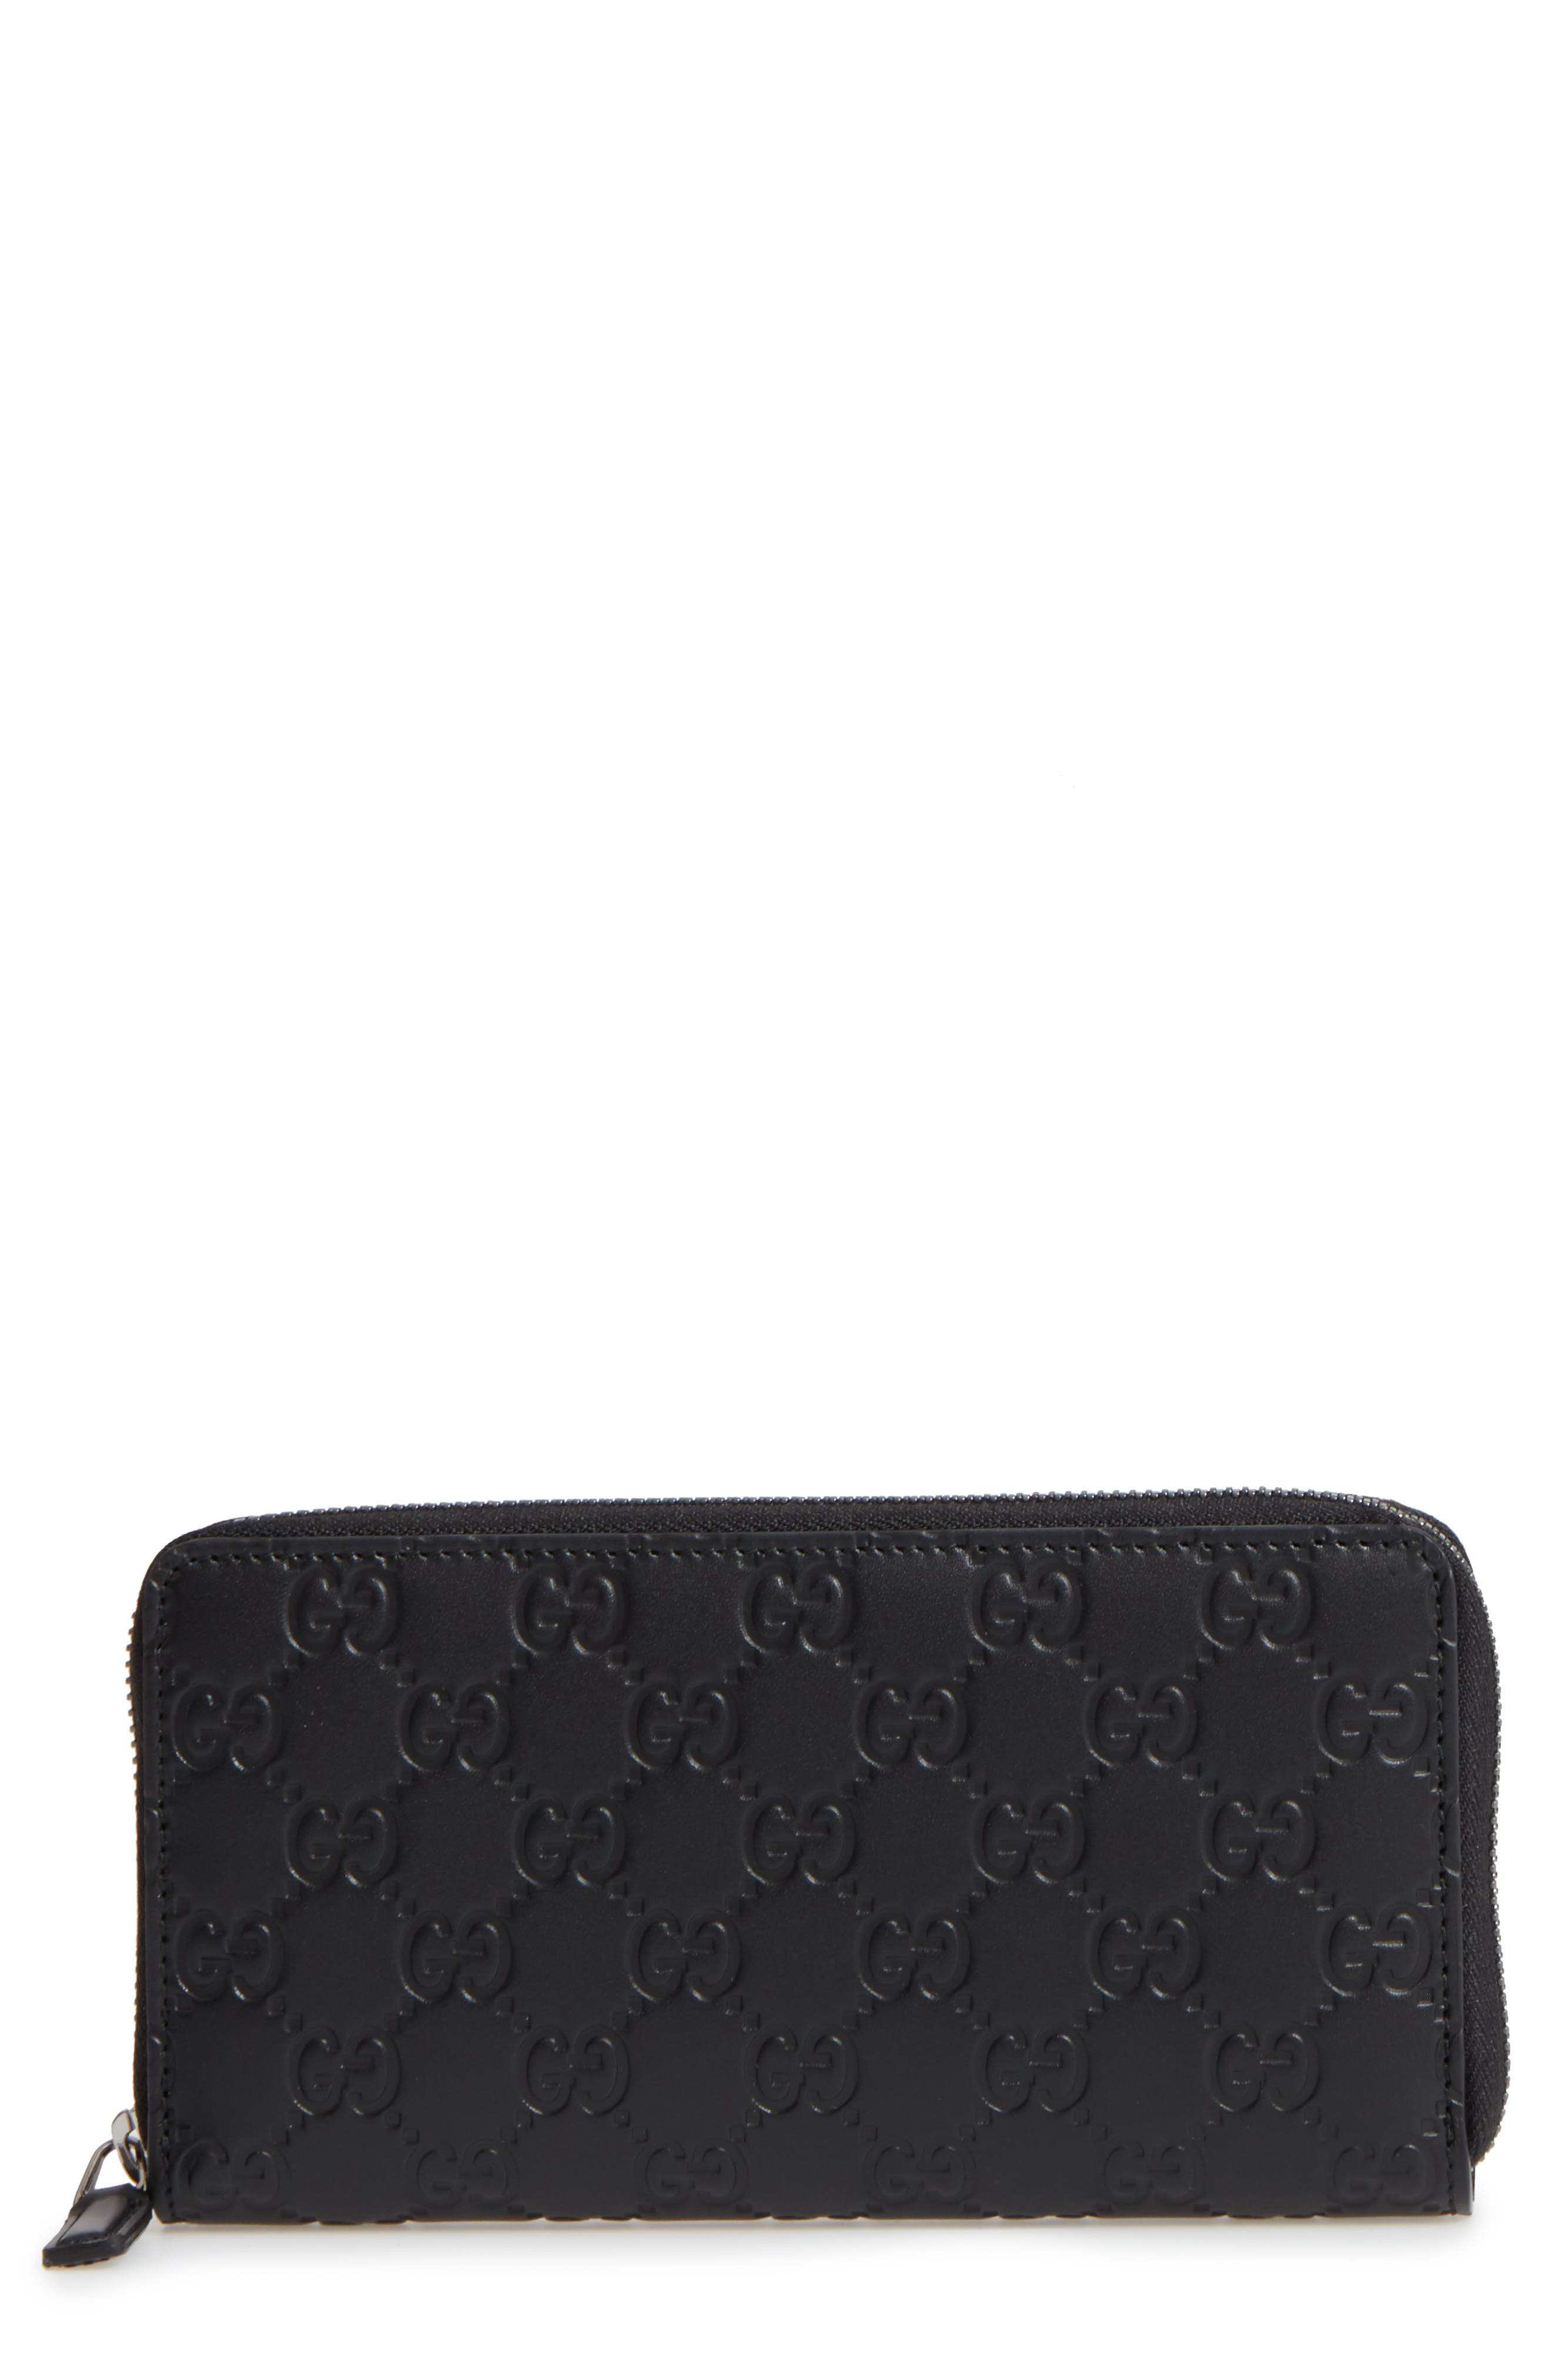 Main Image - Gucci Avel Zip Wallet